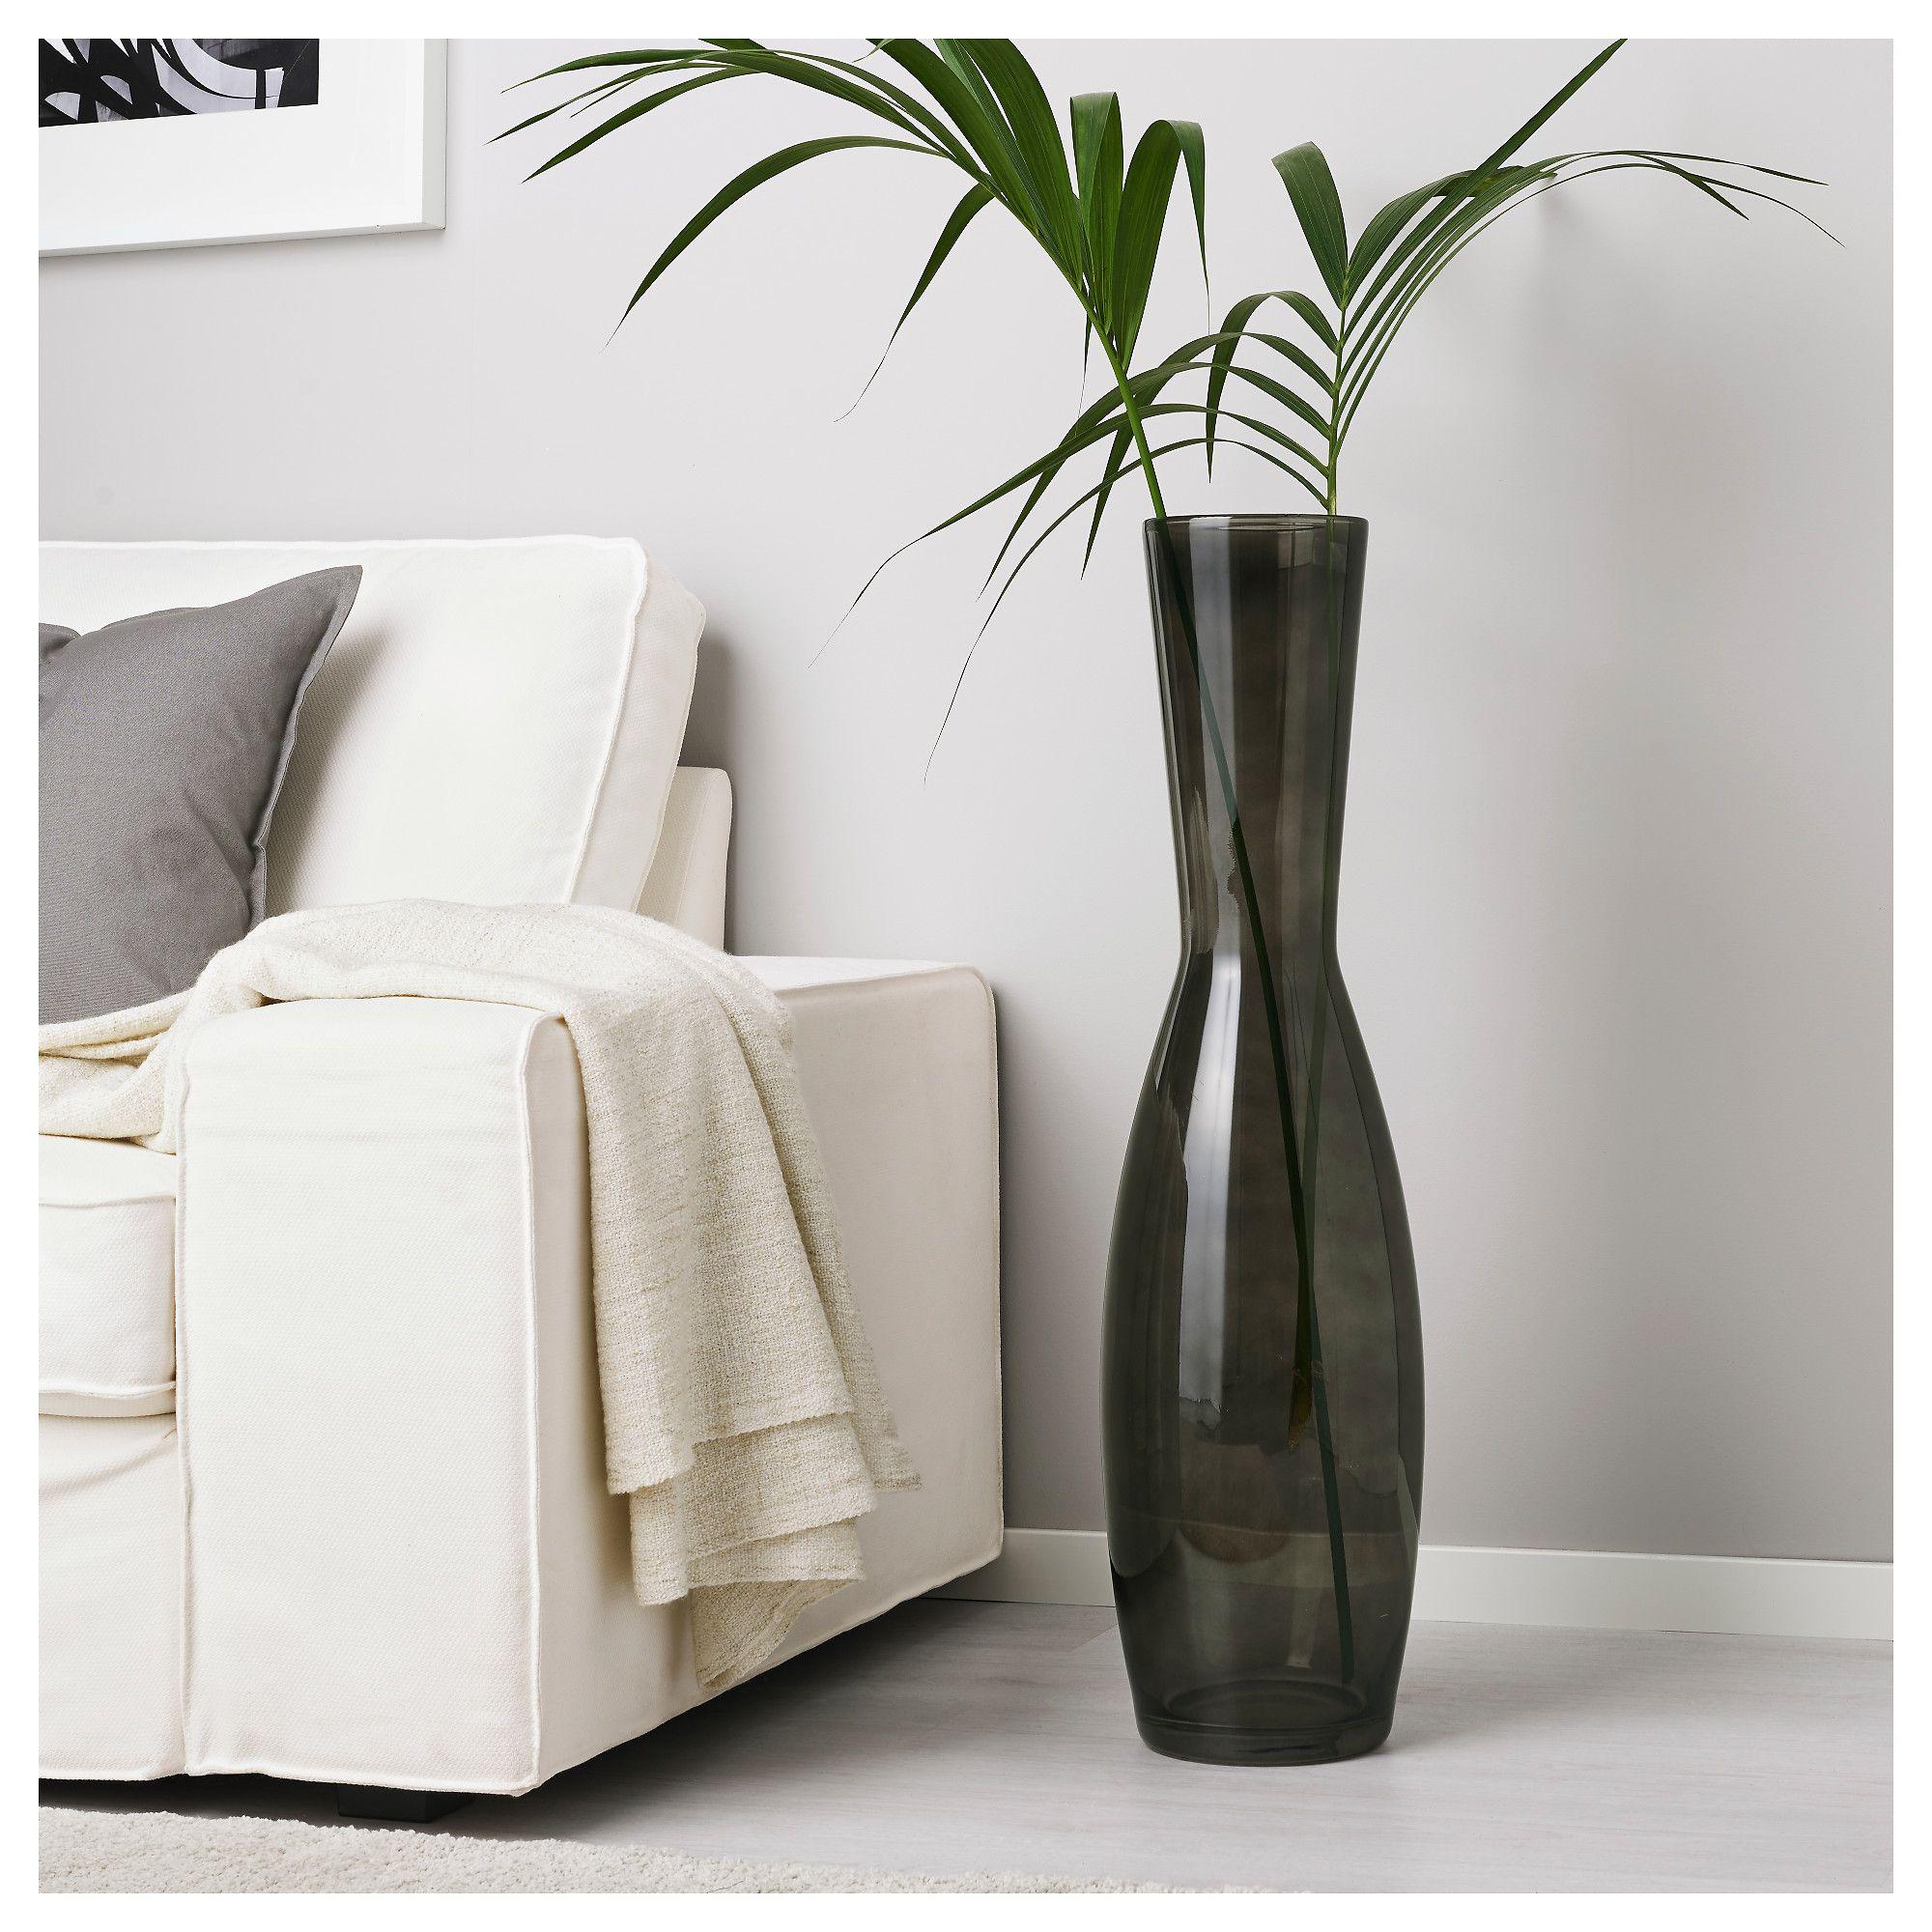 Ikea Fyllig Vase Gray Products Pinterest Ikea Living Room